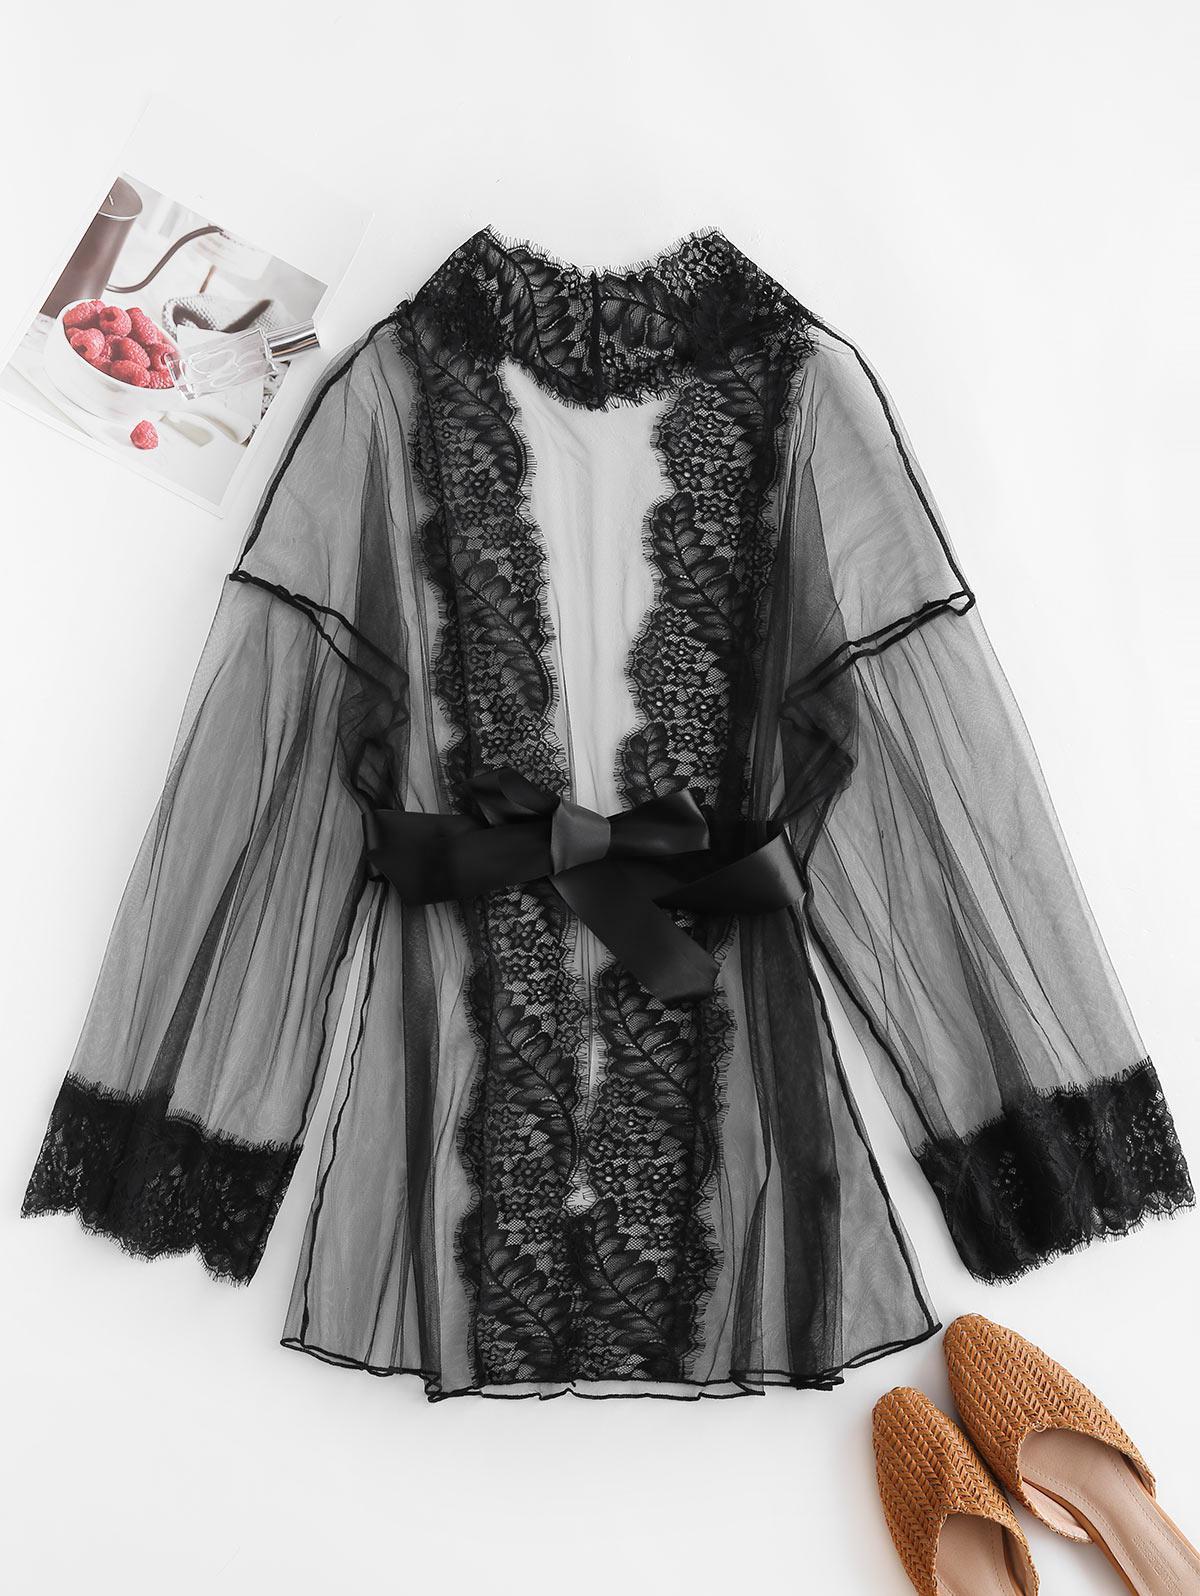 Sheer Mesh Eyelash Lace Panel Lingerie Robe